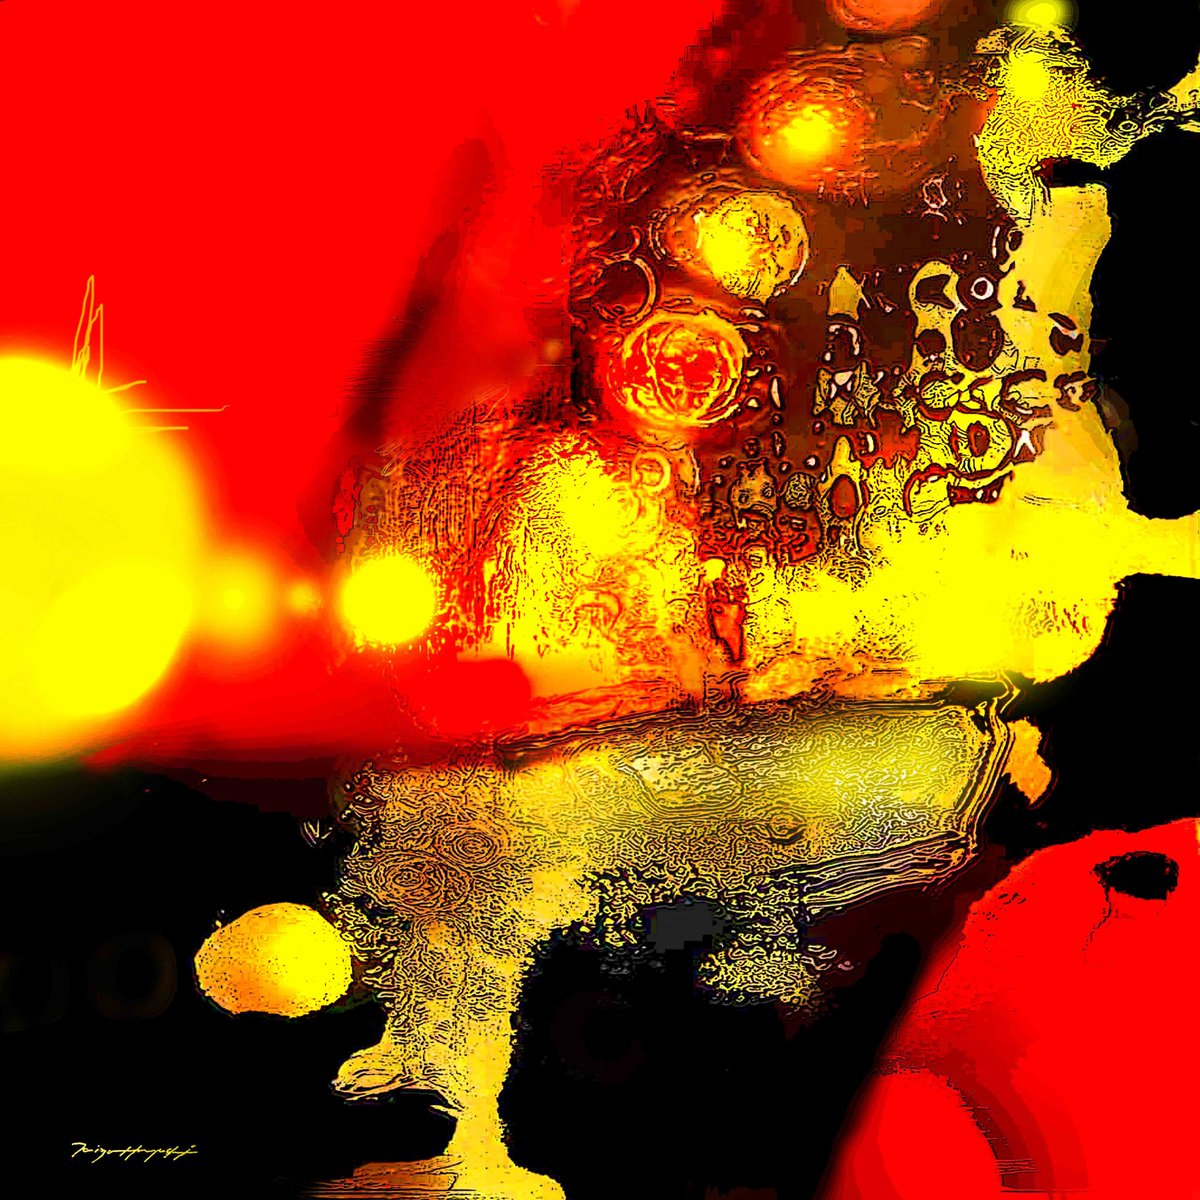 Sunlight of Spain ;  Taizo Hayashi ; Japan     #art #arte #abstractart #abstractpainting #digitalpainting  #digitalart #ContemporaryArt #絵描きさんと繫がりたい  #抽象画 #デジタル絵画 #デジタル #アート  #絵画pic.twitter.com/hsiCCqn5cs